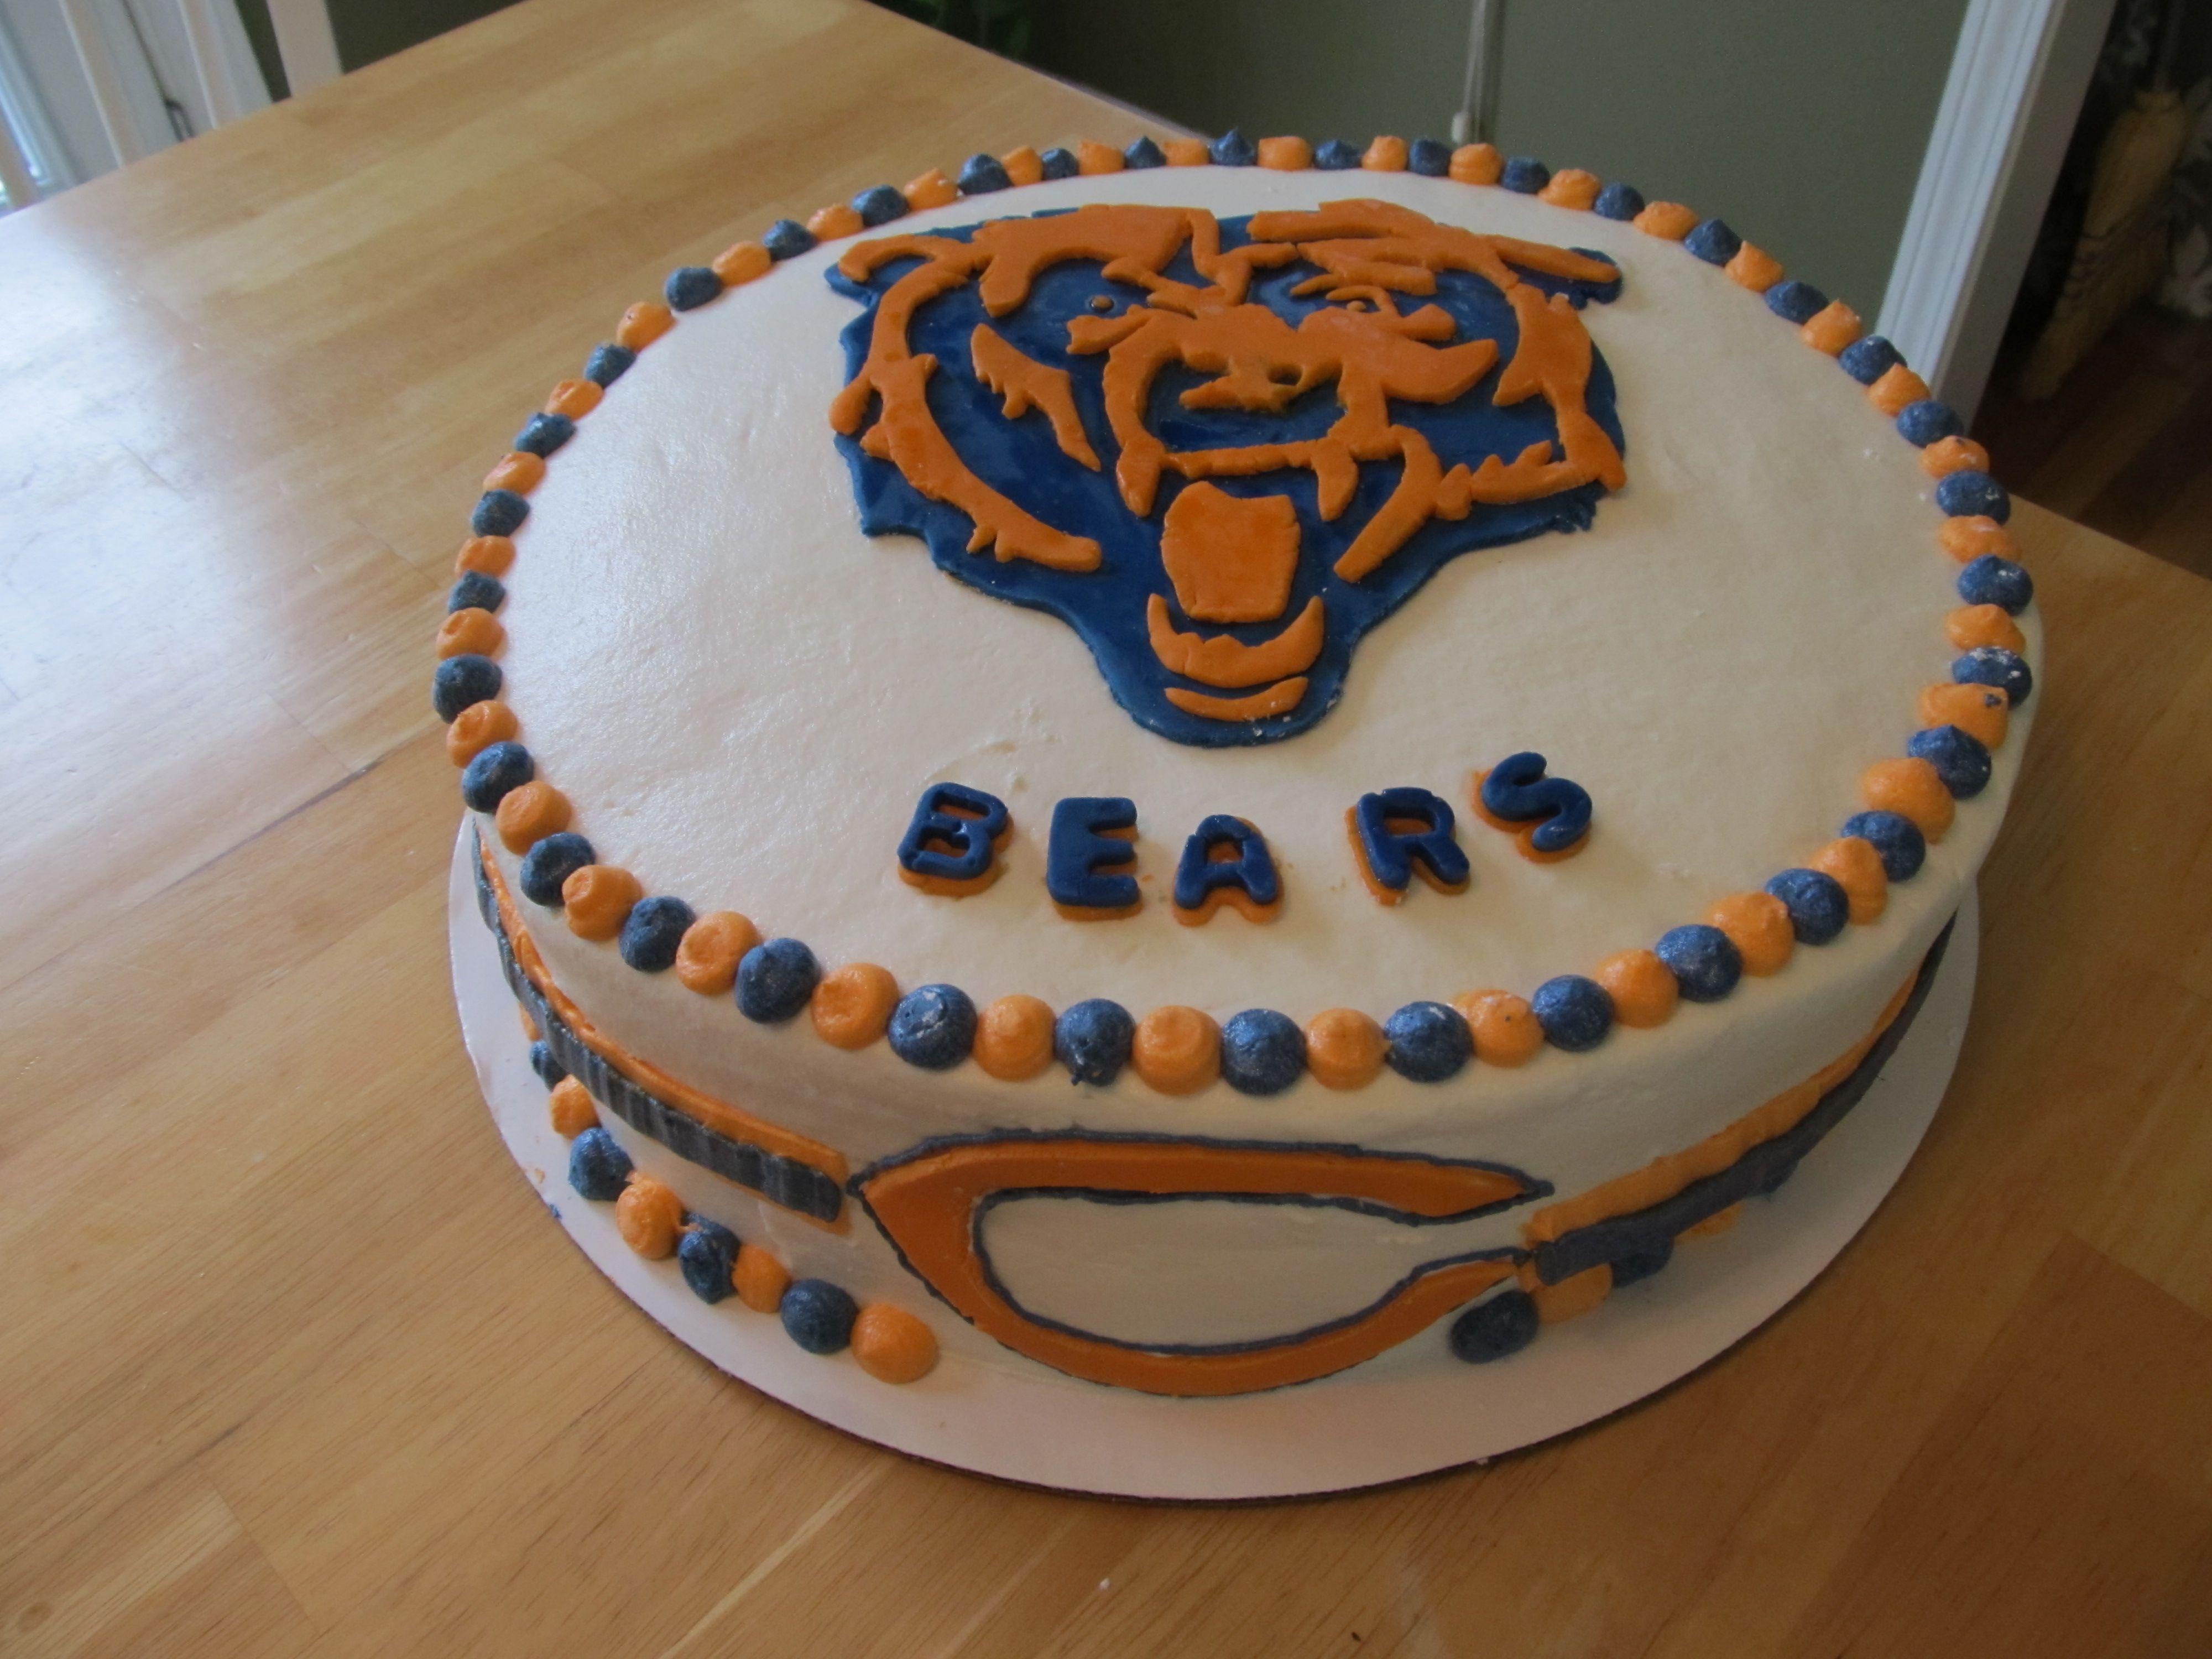 Tremendous Chicago Bears Birthday Cake Cake Designs Birthday Cake Bithday Funny Birthday Cards Online Fluifree Goldxyz